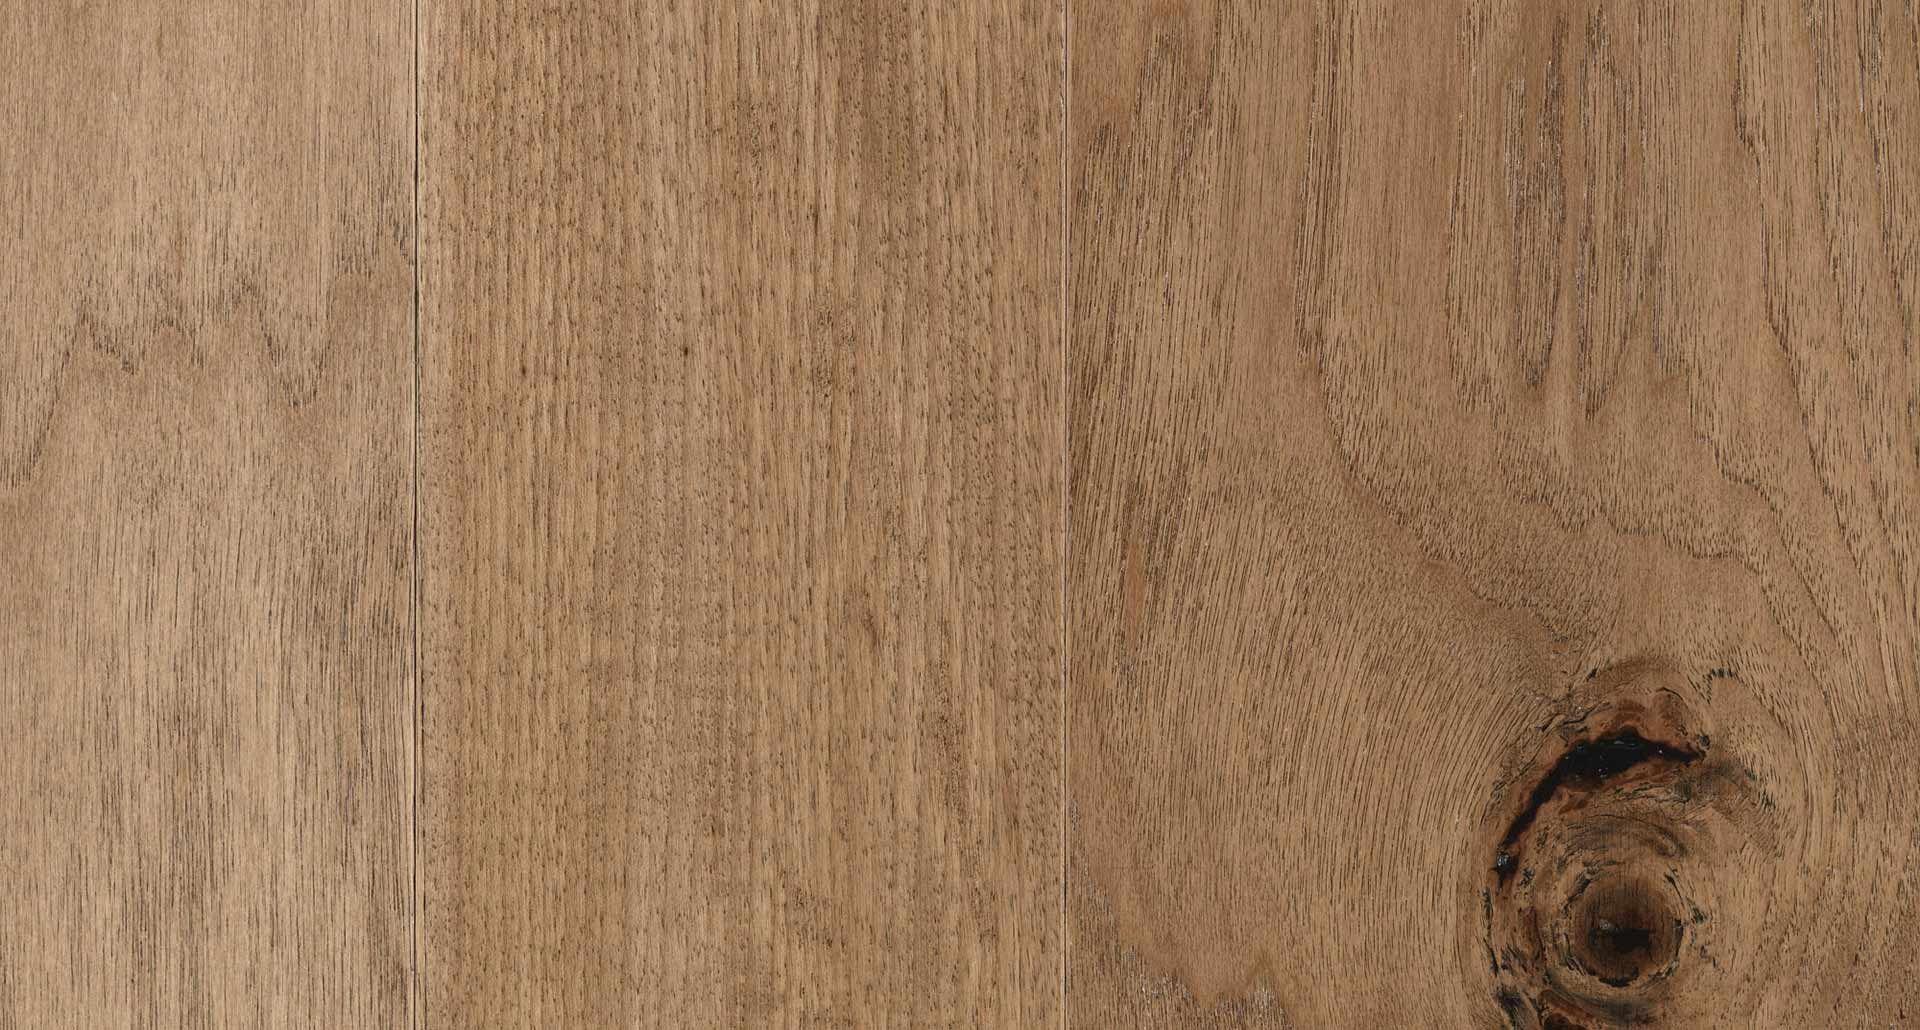 shaw hardwood floors w pin flooring engineered prefinished castel hickory in